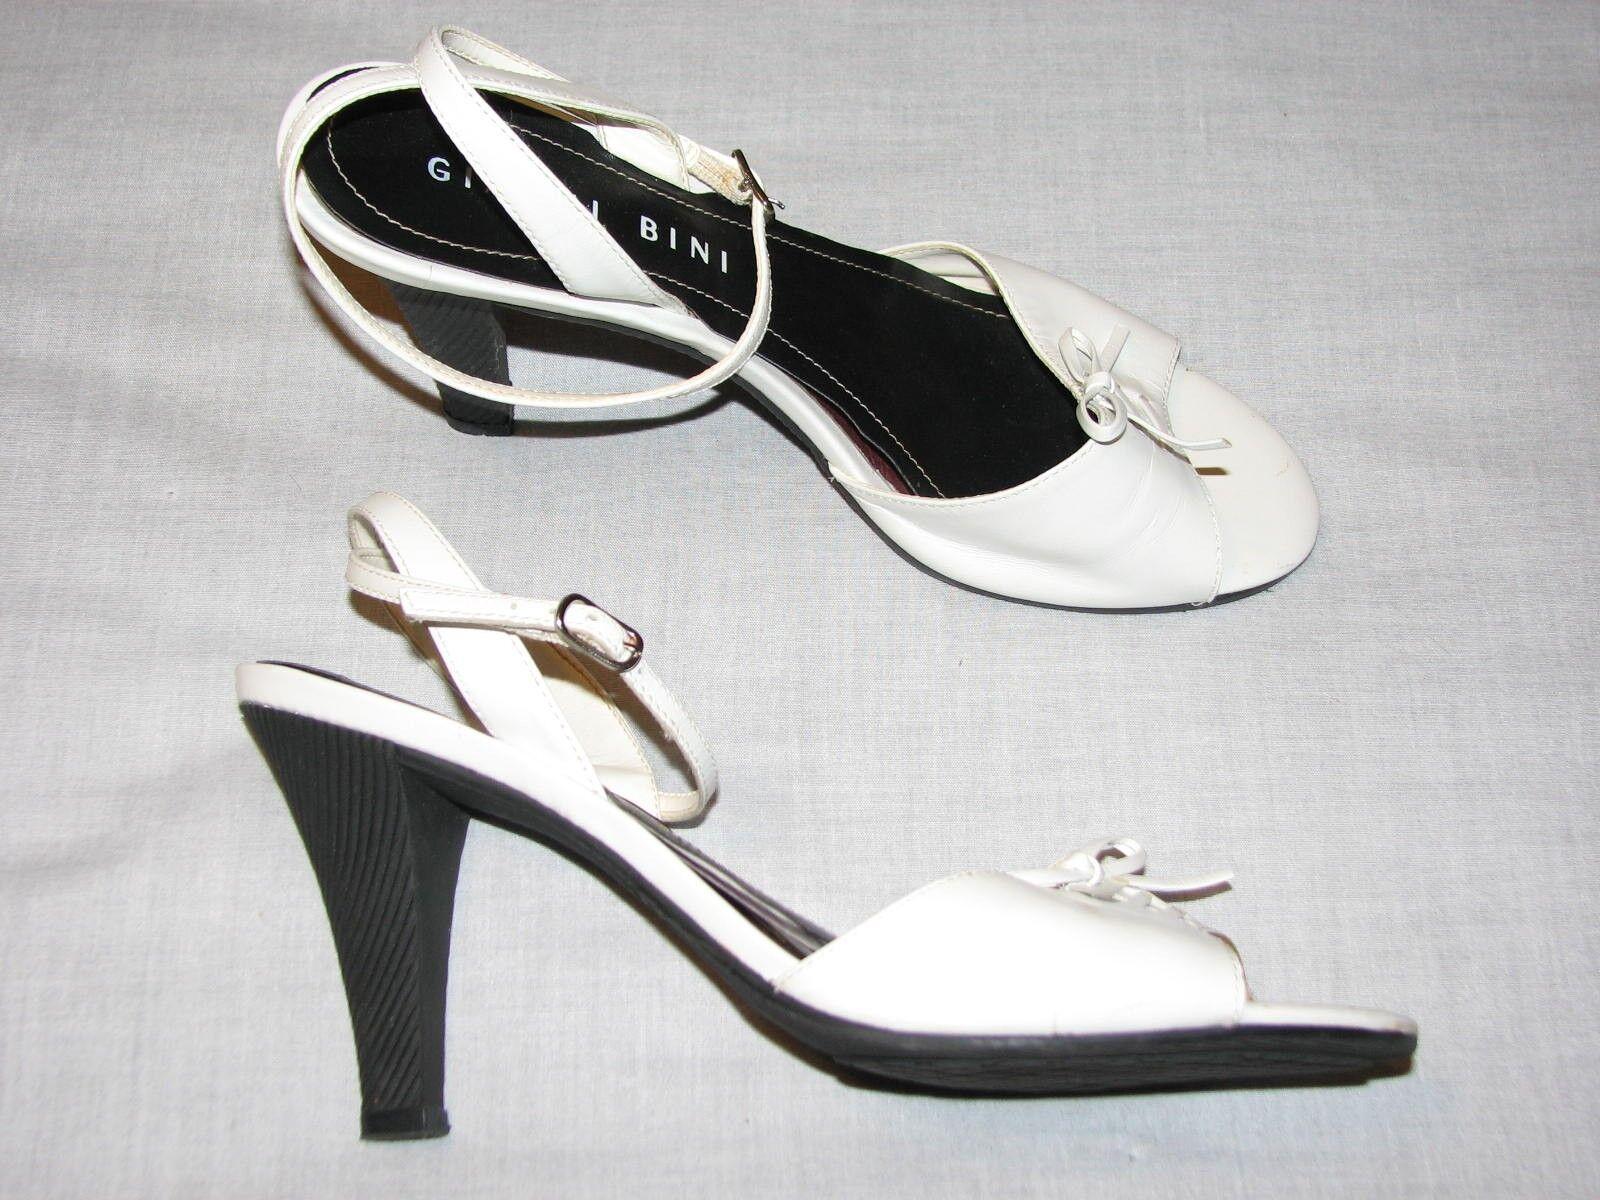 8.5 M Ladies Gianni Bini White Leather Ladies M Shoes Poetry Woemsn strappy high heels B 8ca800